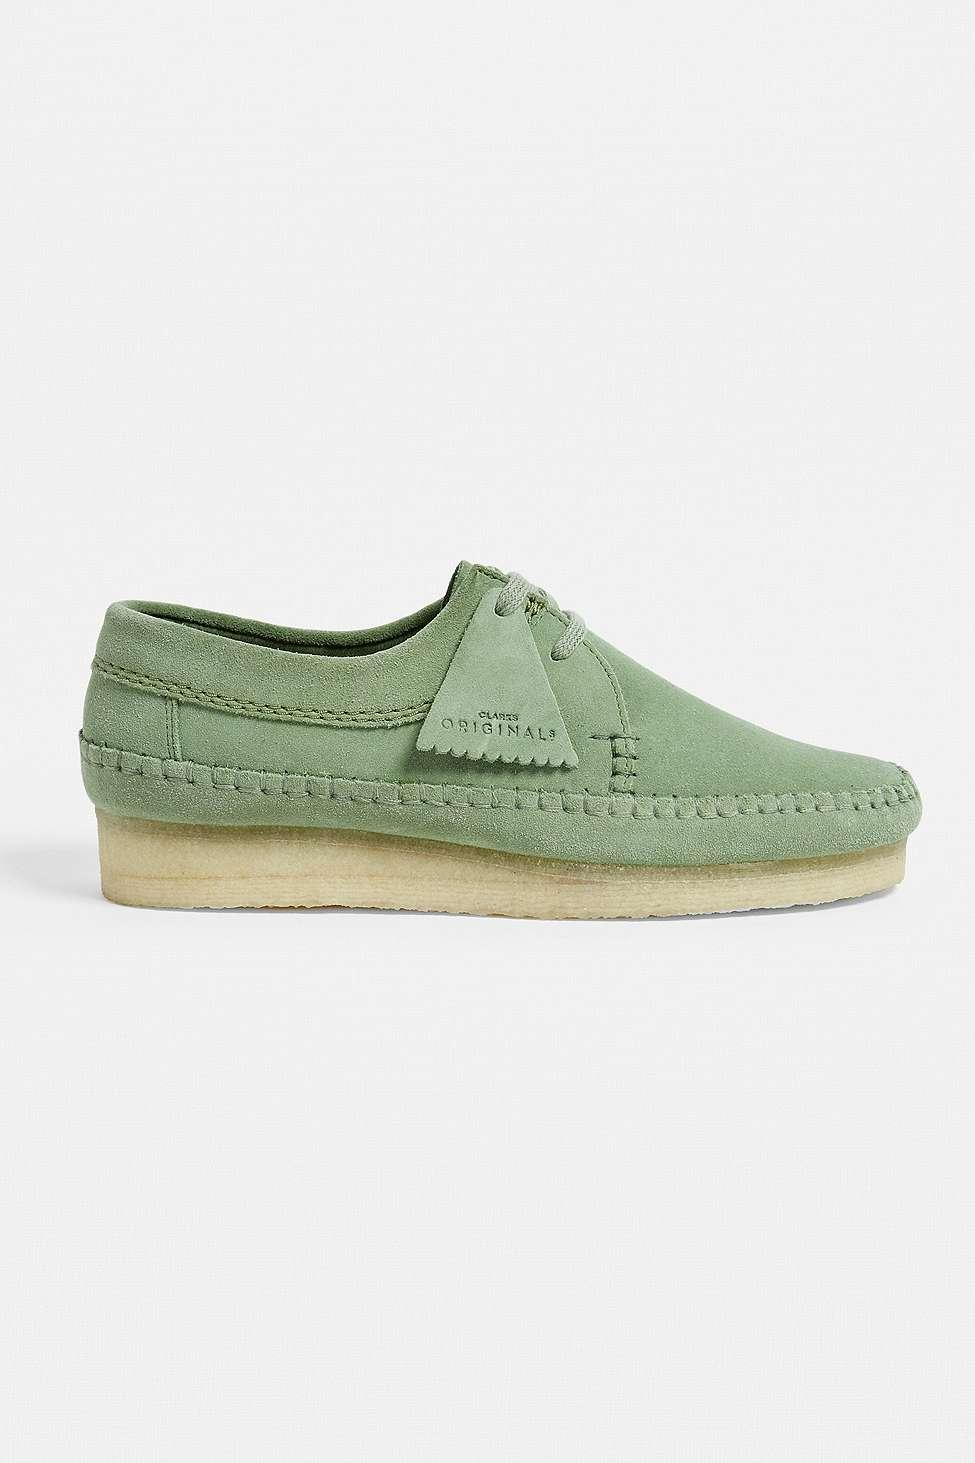 b6b9efe16551 Clarks Weaver Cactus Green Suede Shoes - Mens Uk 10 in Green for Men ...